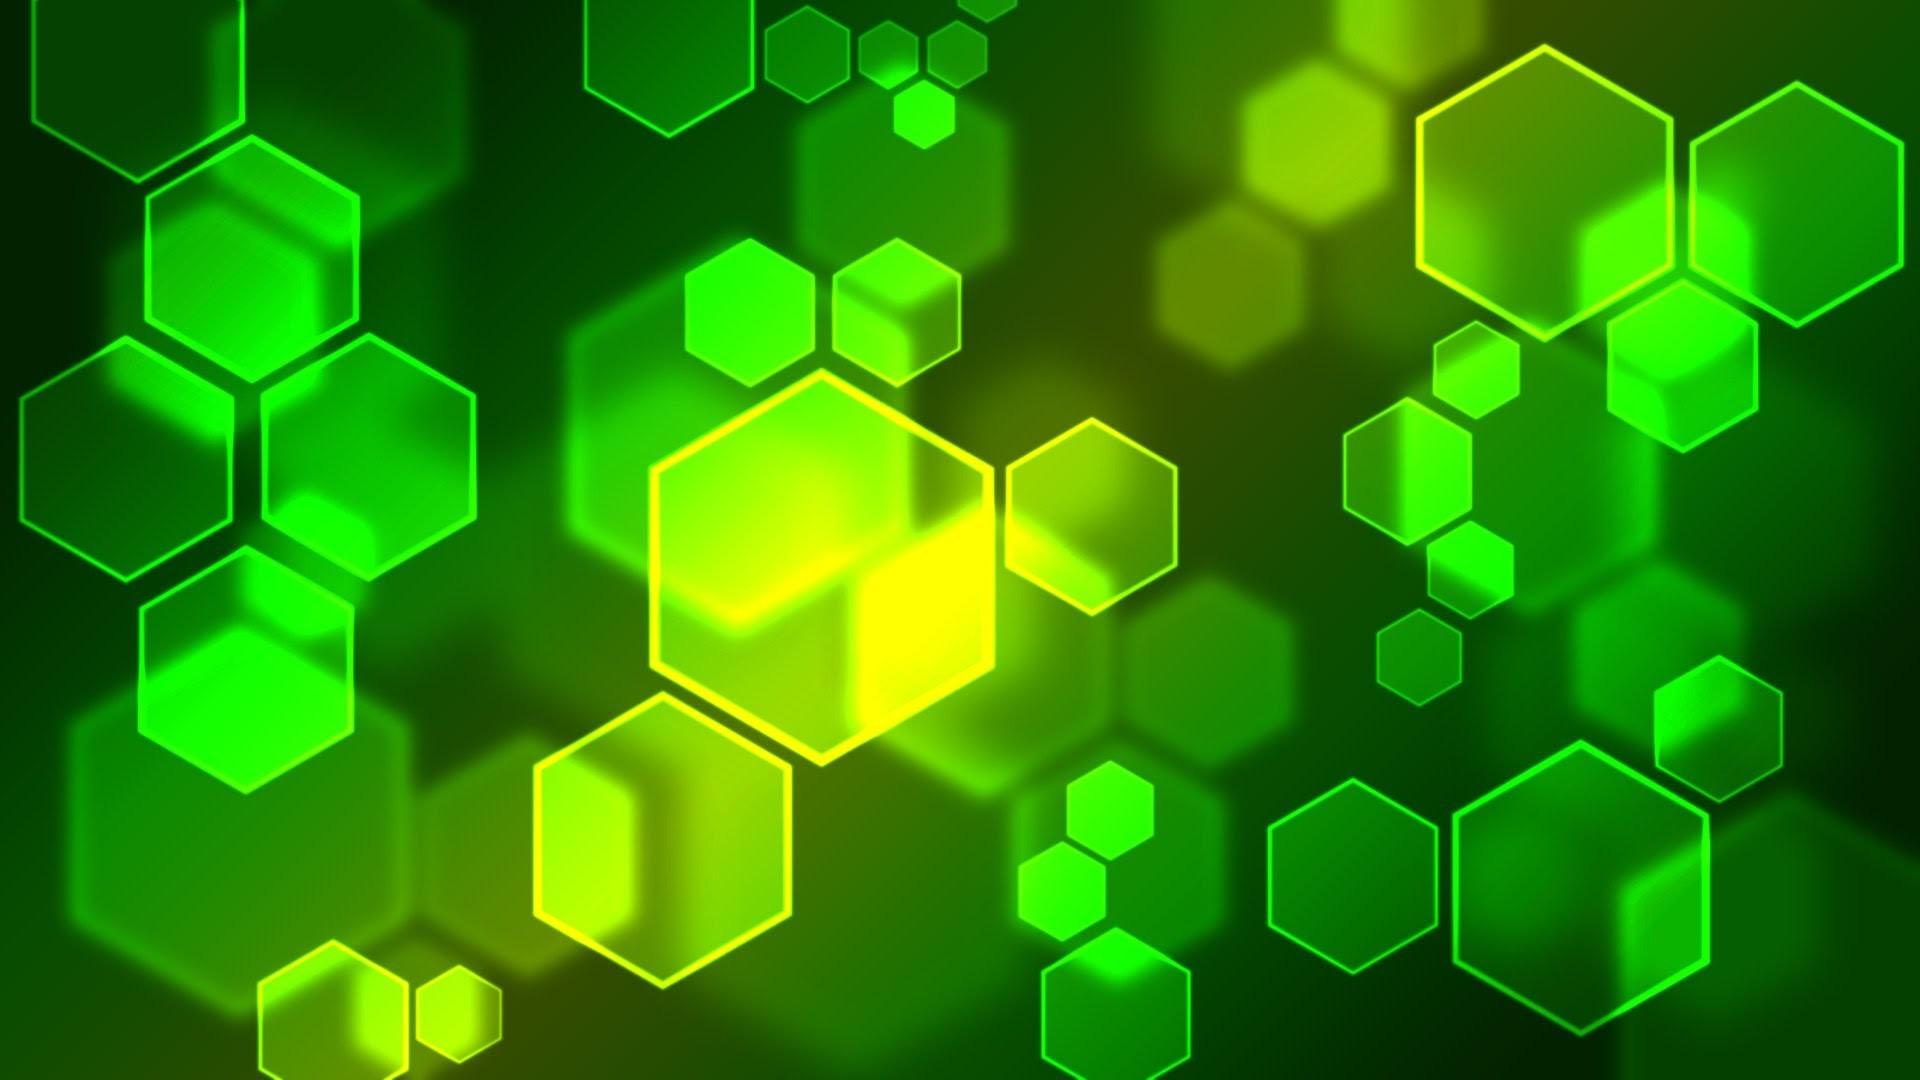 Res: 1920x1080, How to create hexagon bokeh wallpaper in Adobe  Photoshop